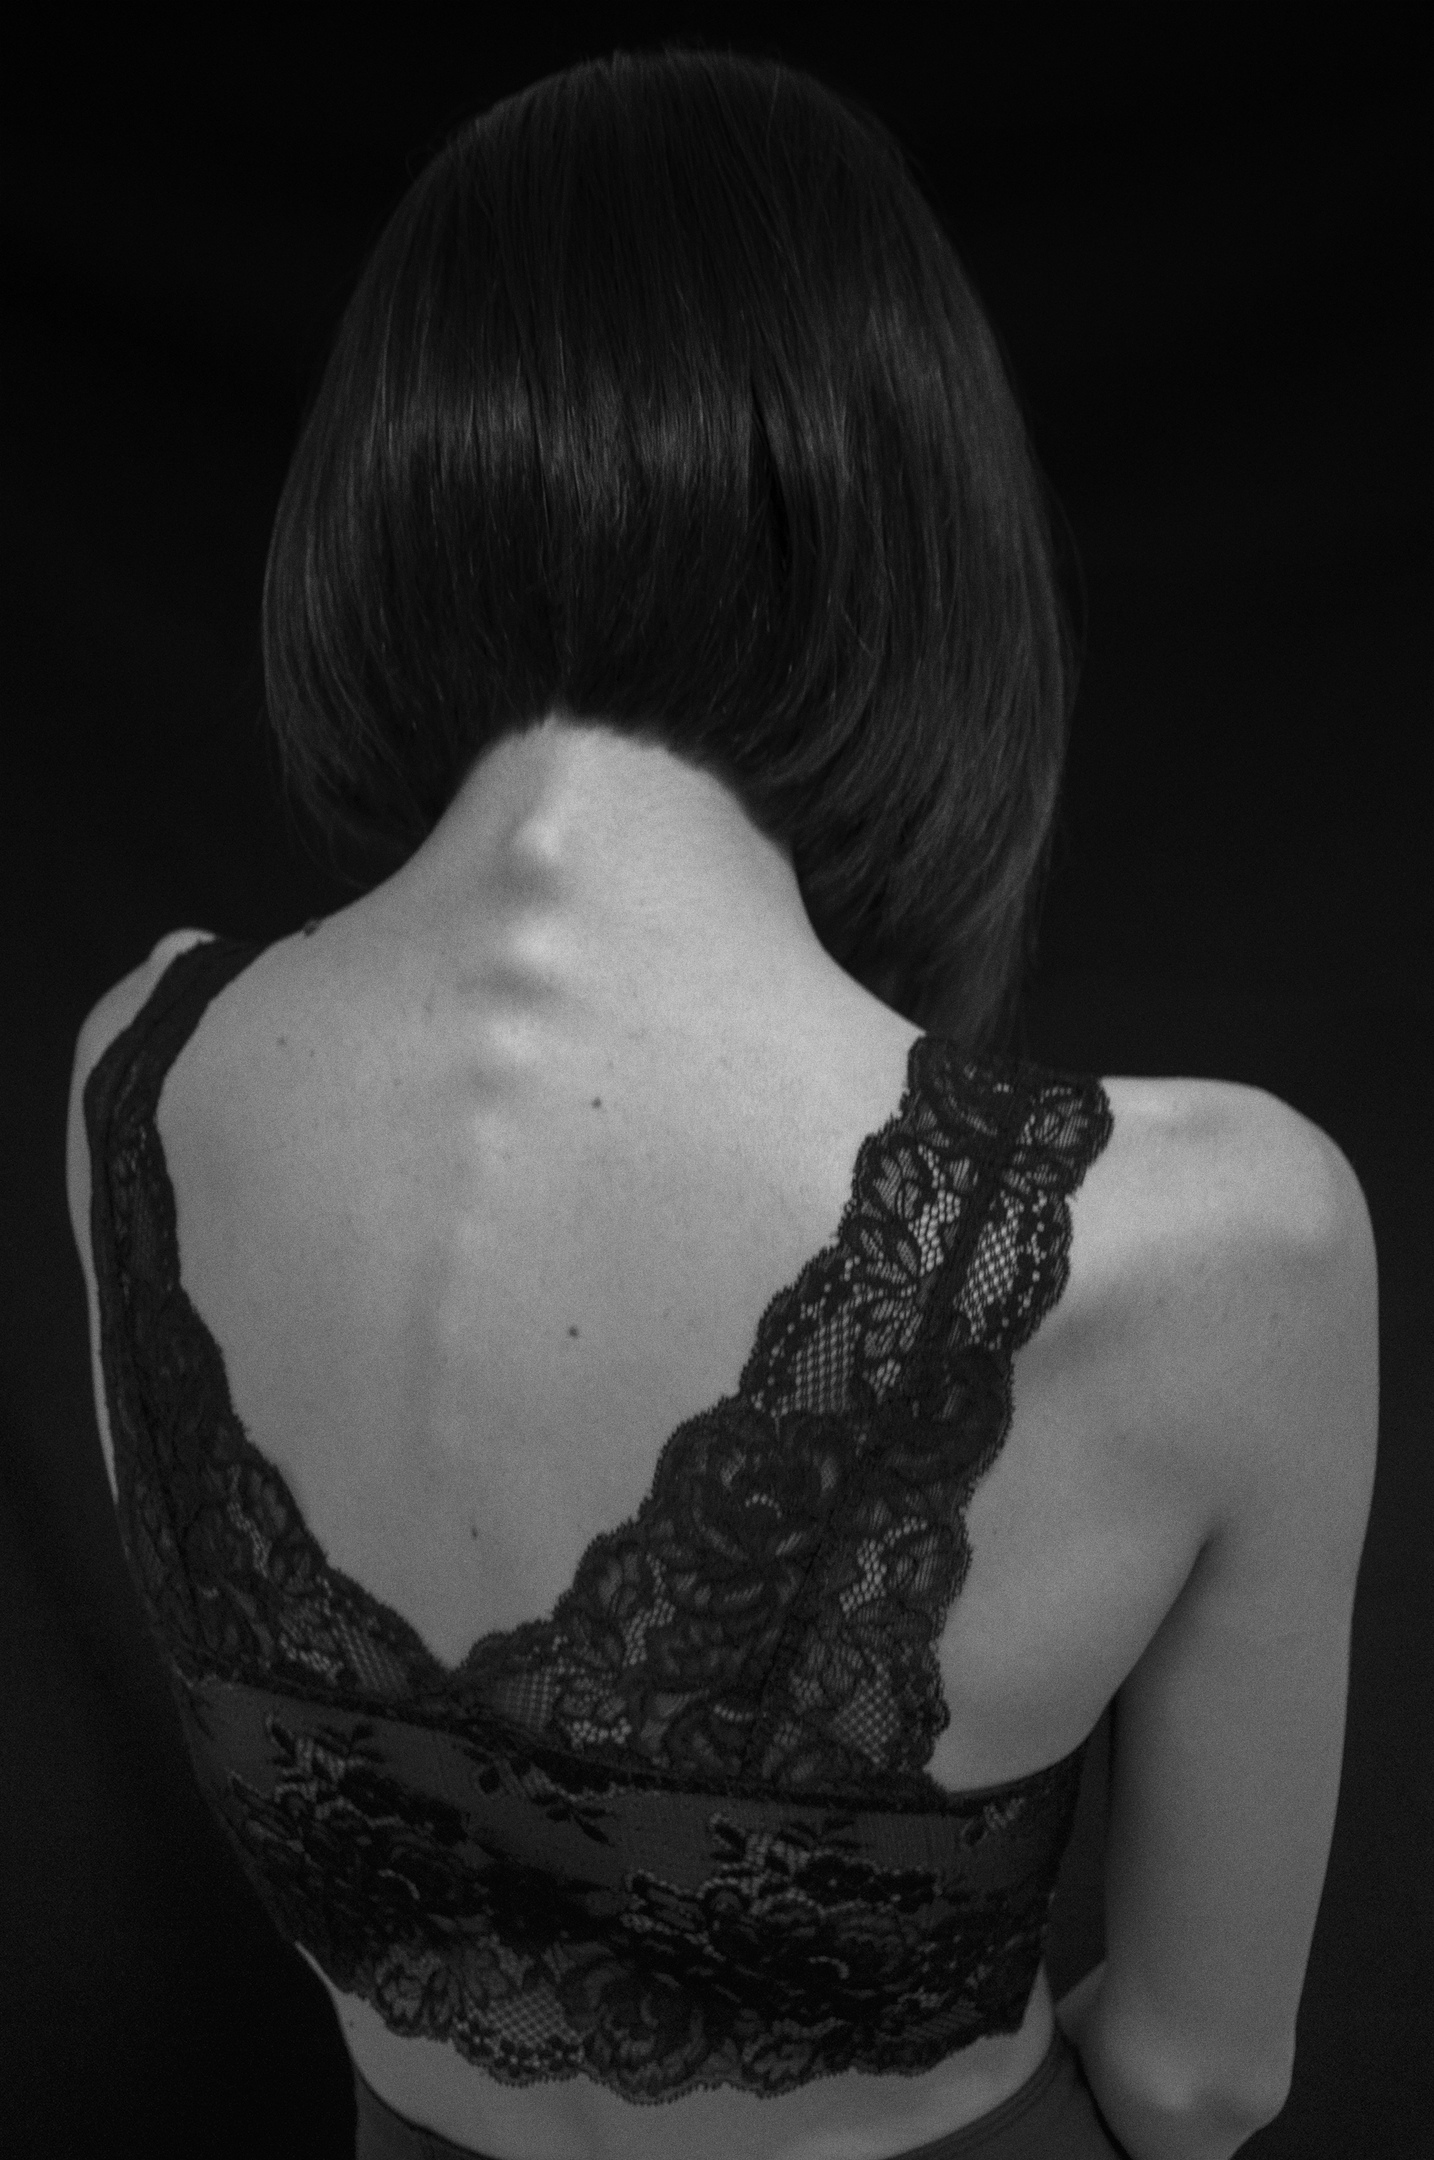 https://youngfolks.ru/pub/model-nastya-borisova